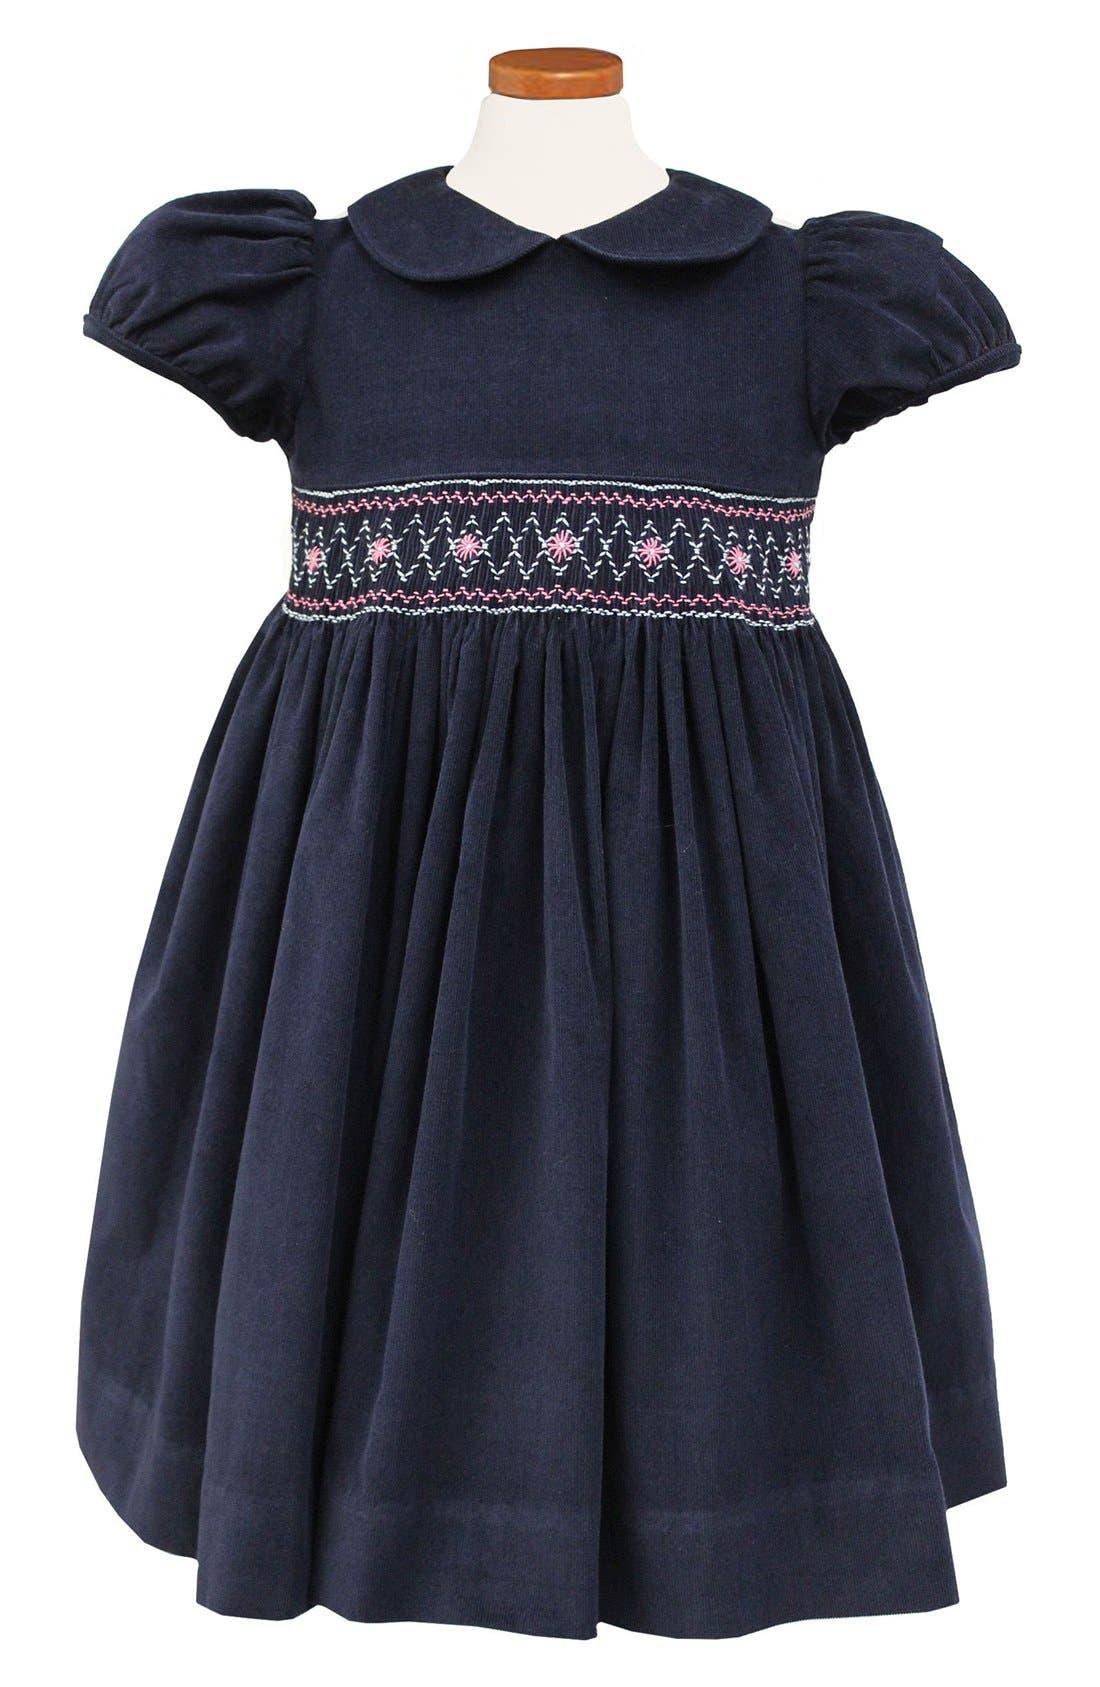 SORBET Embroidered Smocked Waist Dress